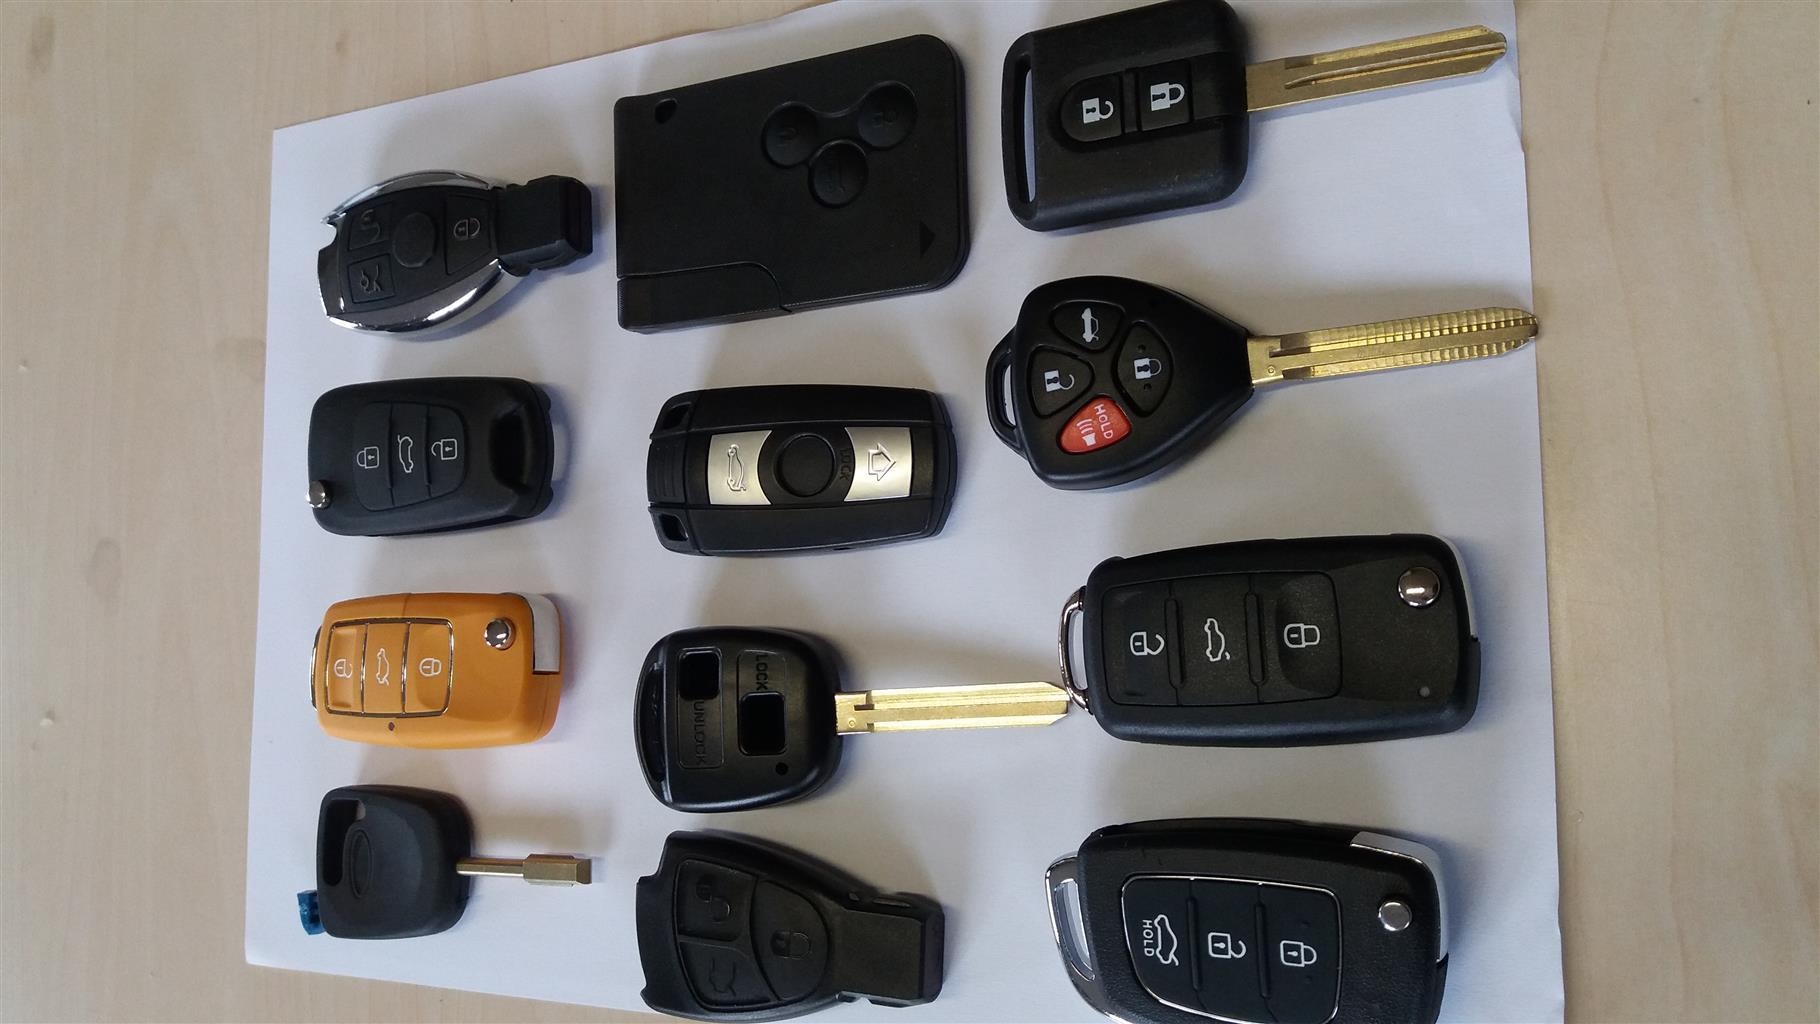 Auto Transponder keys